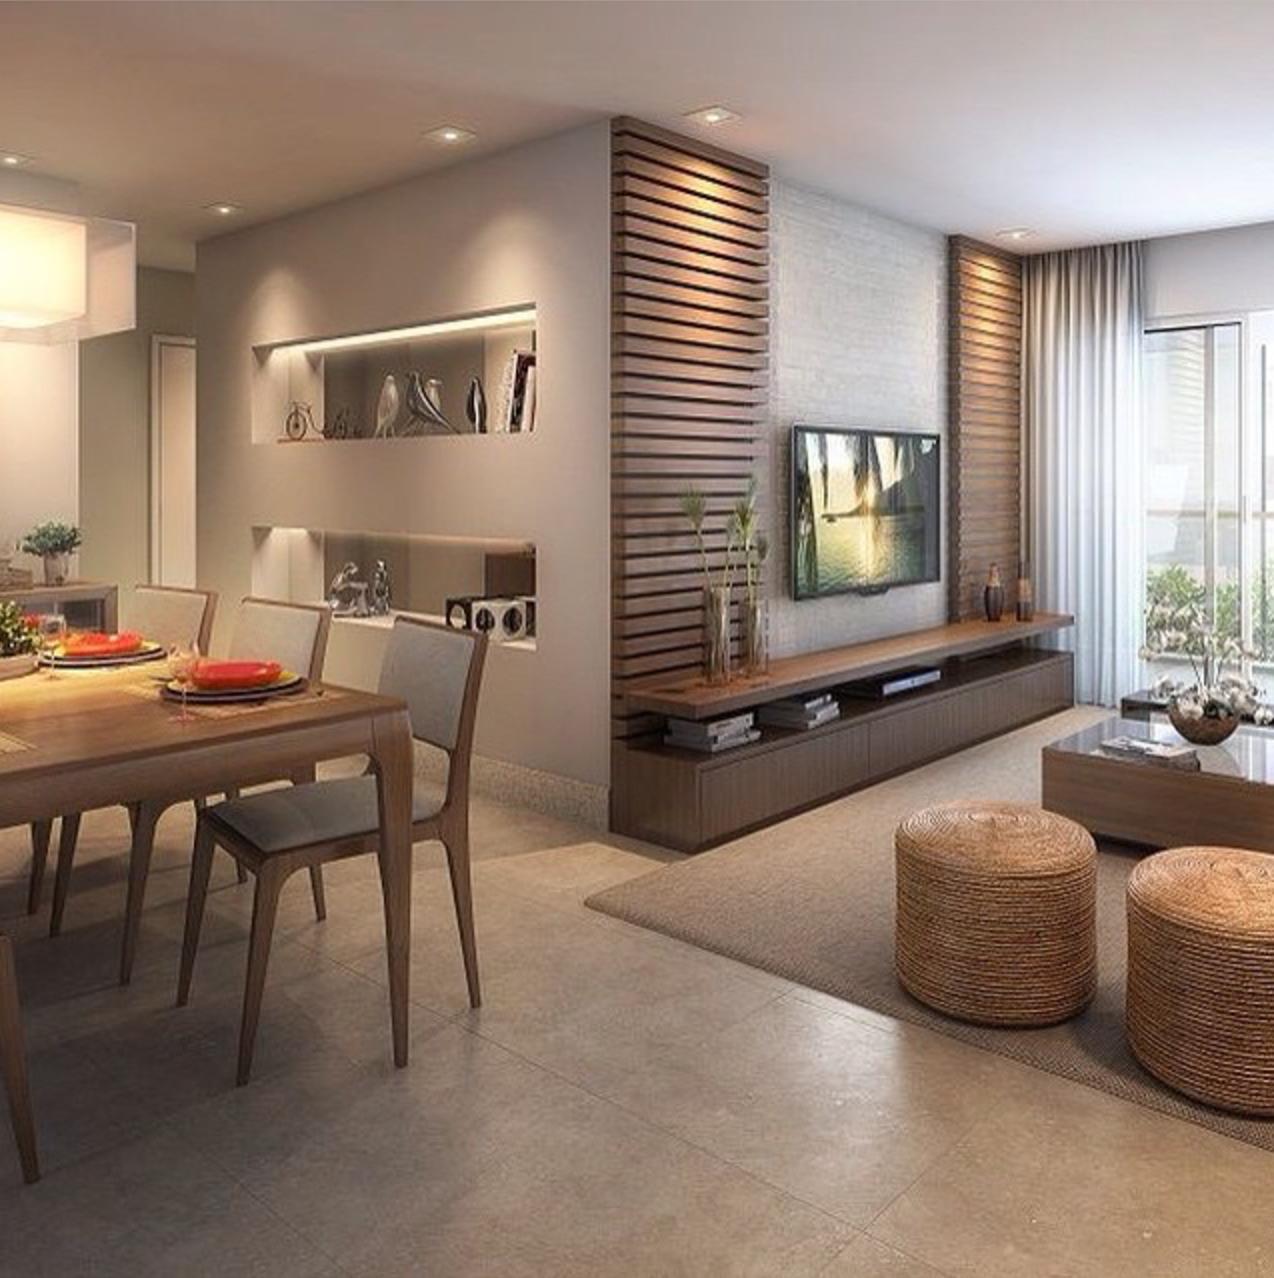 Interior Design Image By Jaye Cairo On Gray